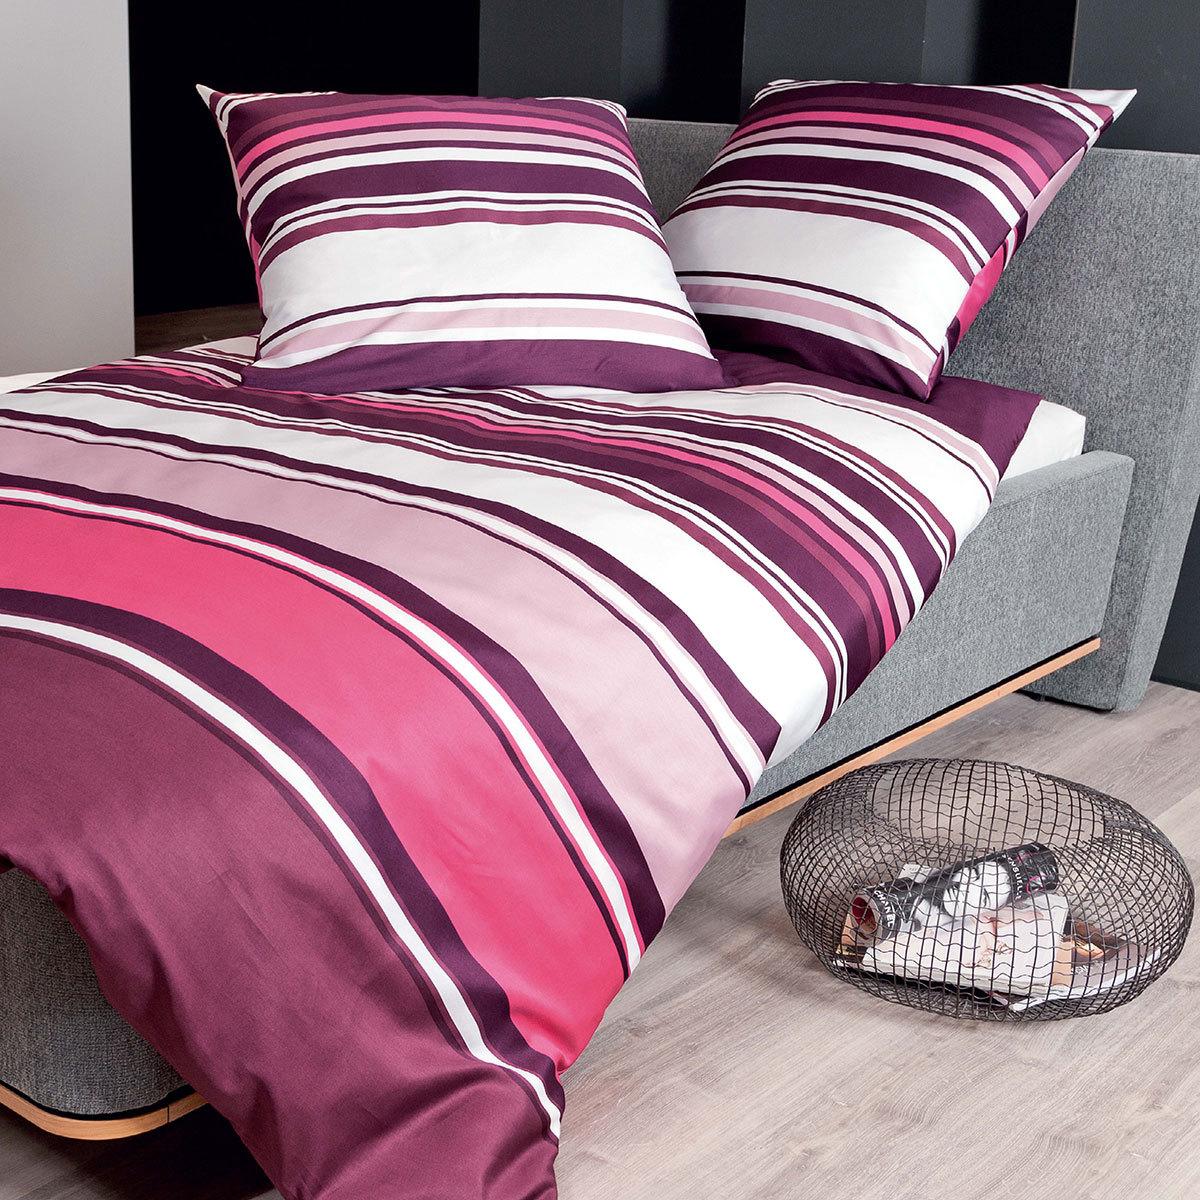 janine mako satin bettw sche j d 87018 05 beere g nstig online kaufen bei bettwaren shop. Black Bedroom Furniture Sets. Home Design Ideas